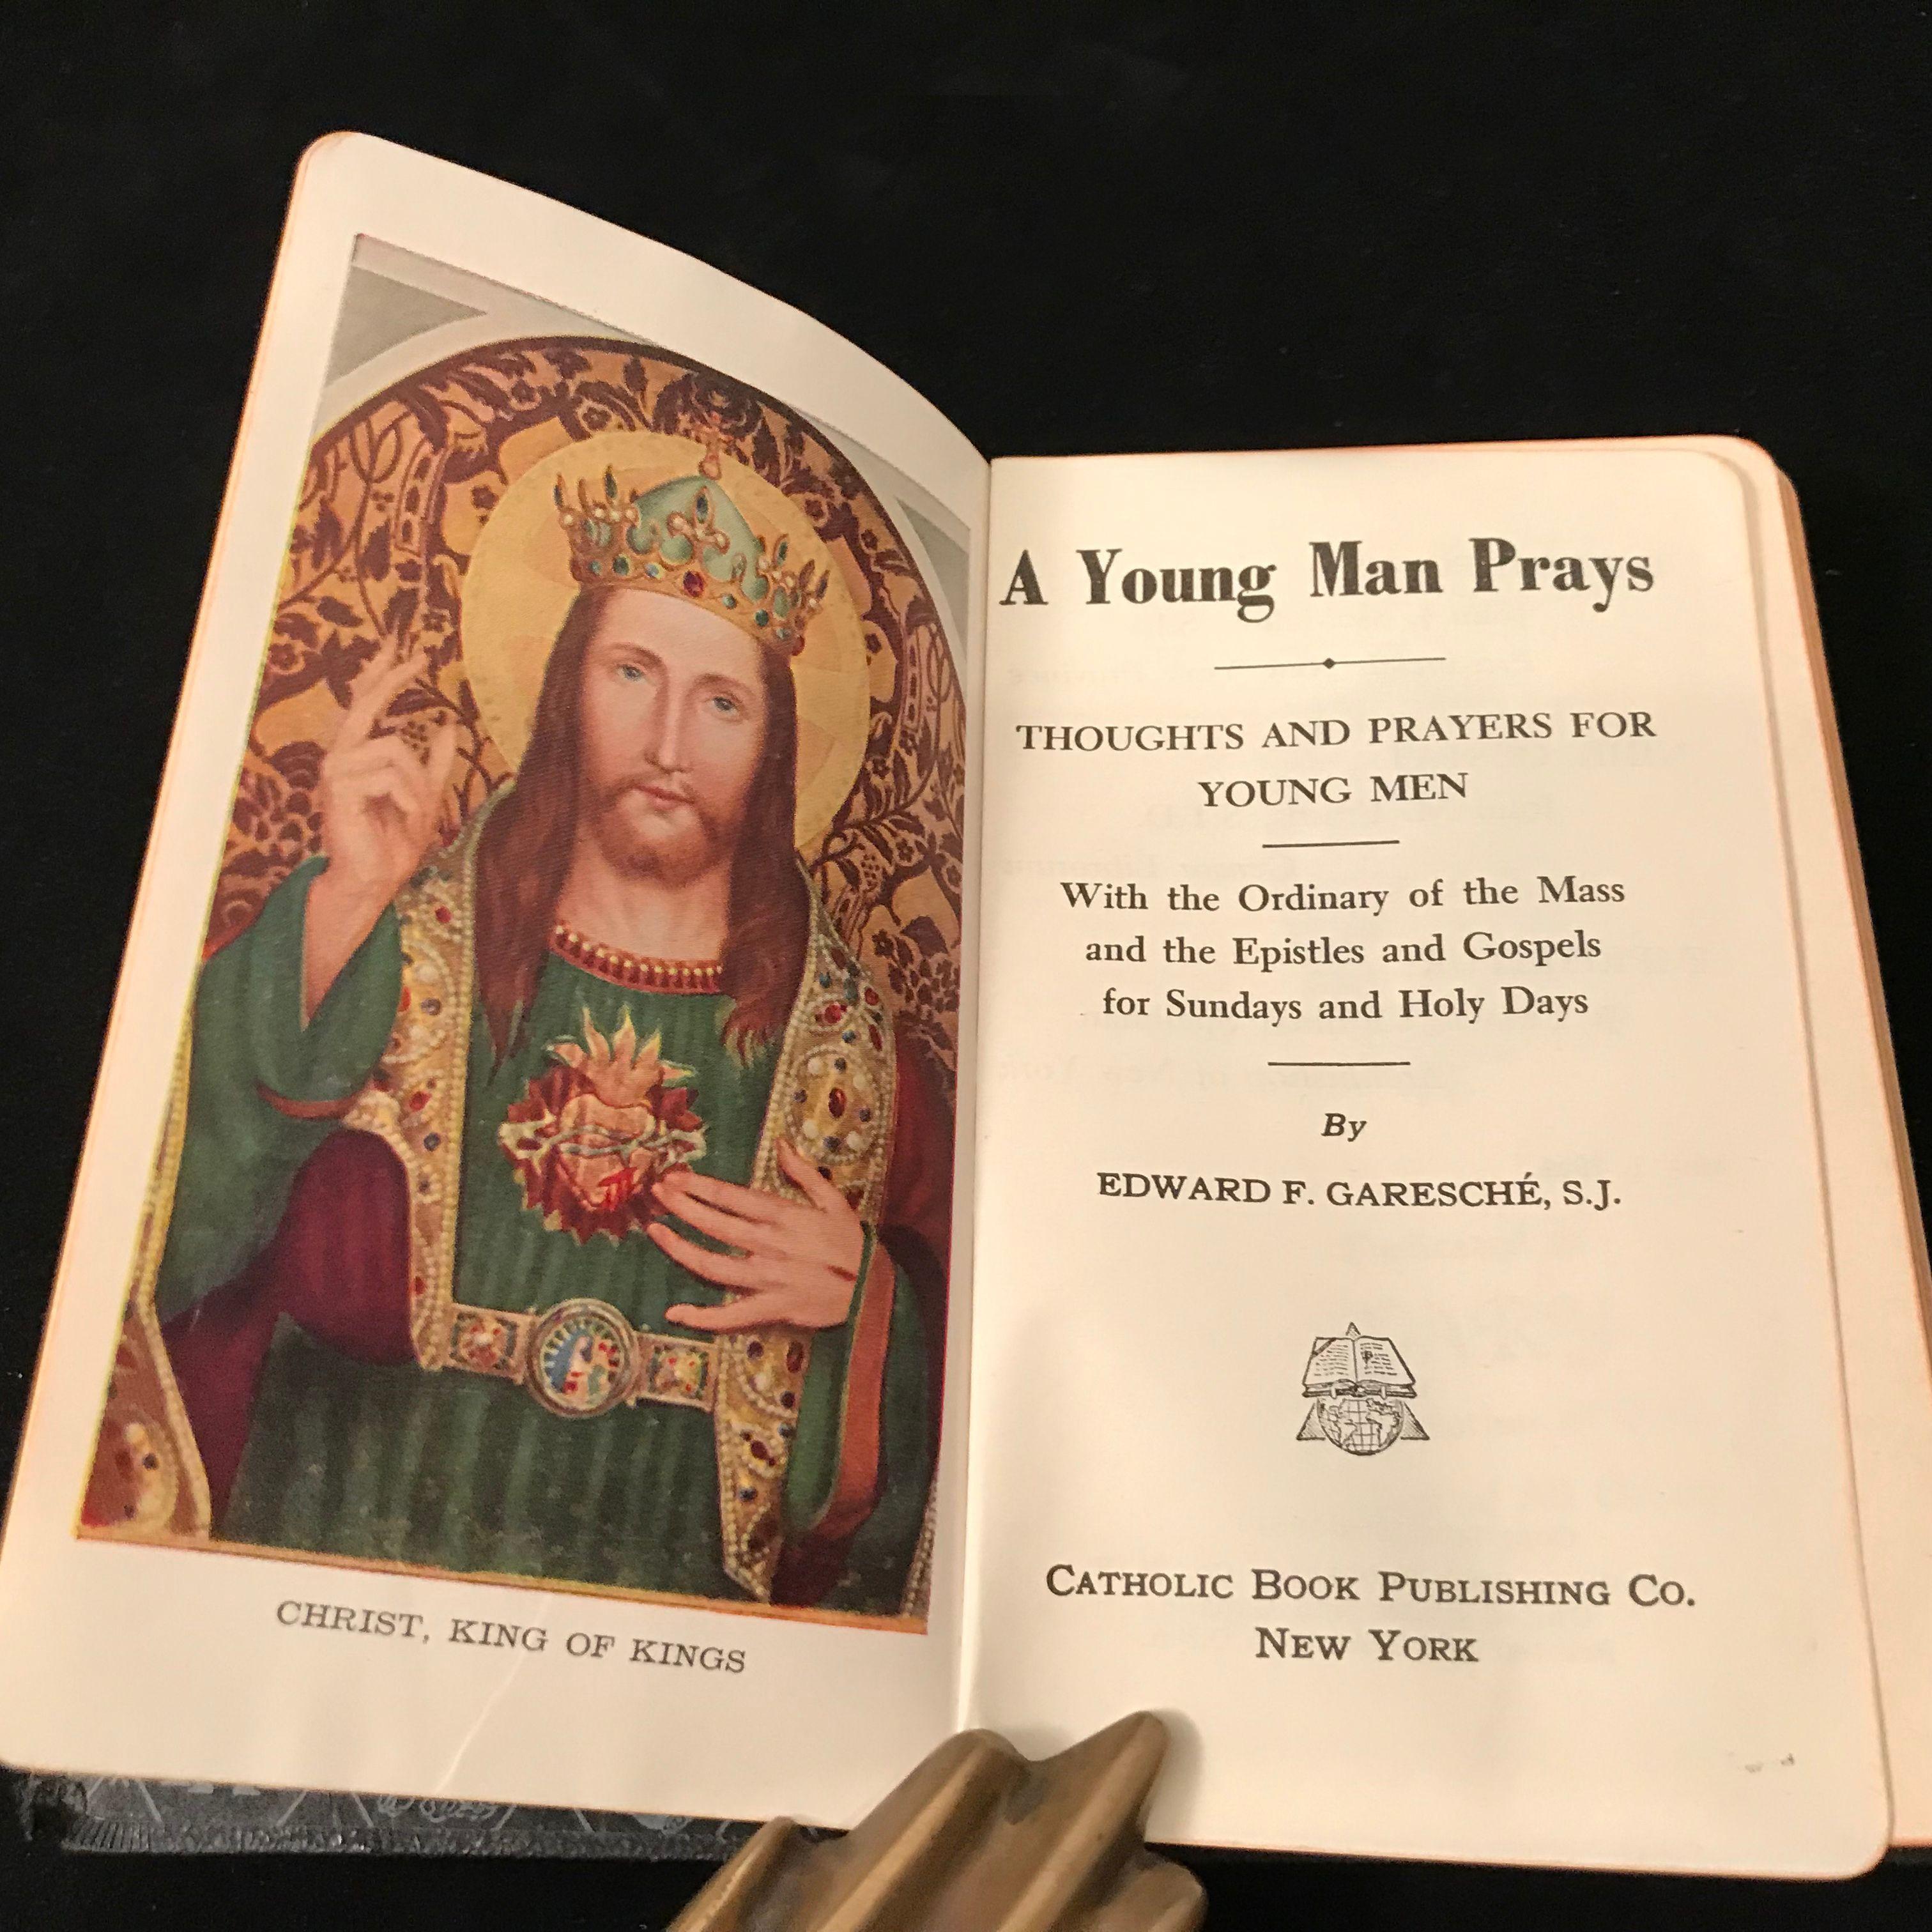 A Young Man Prays by Garesche Pocket Prayer Book in 2019